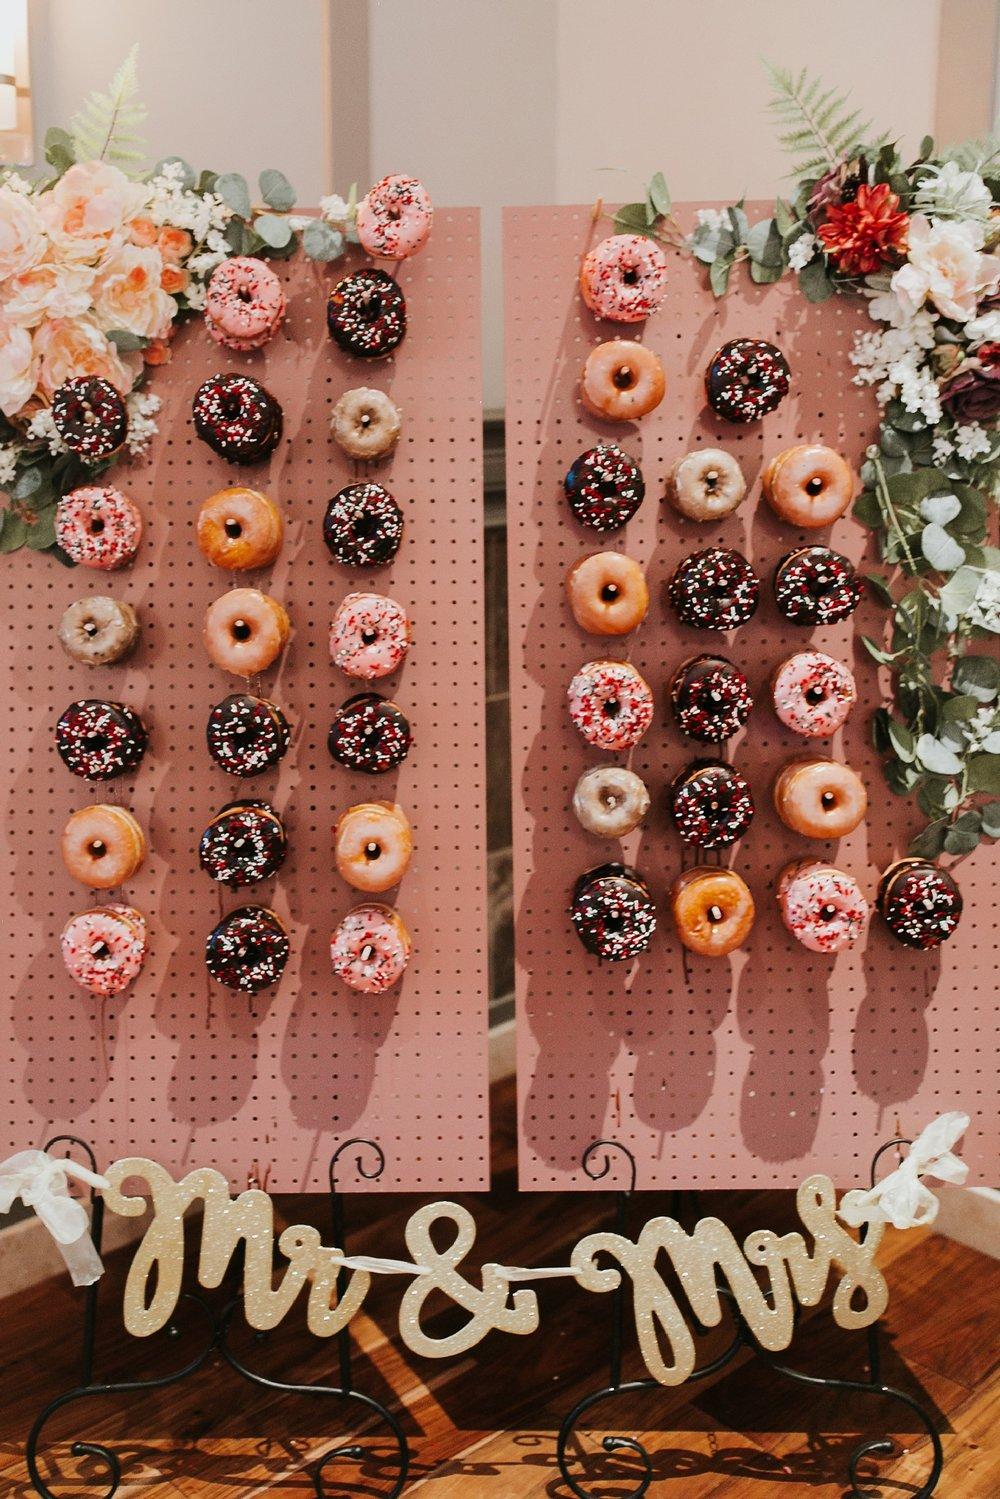 Alicia+lucia+photography+-+albuquerque+wedding+photographer+-+santa+fe+wedding+photography+-+new+mexico+wedding+photographer+-+wedding+reception+-+wedding+sweets+-+wedding+reception+details_0030.jpg